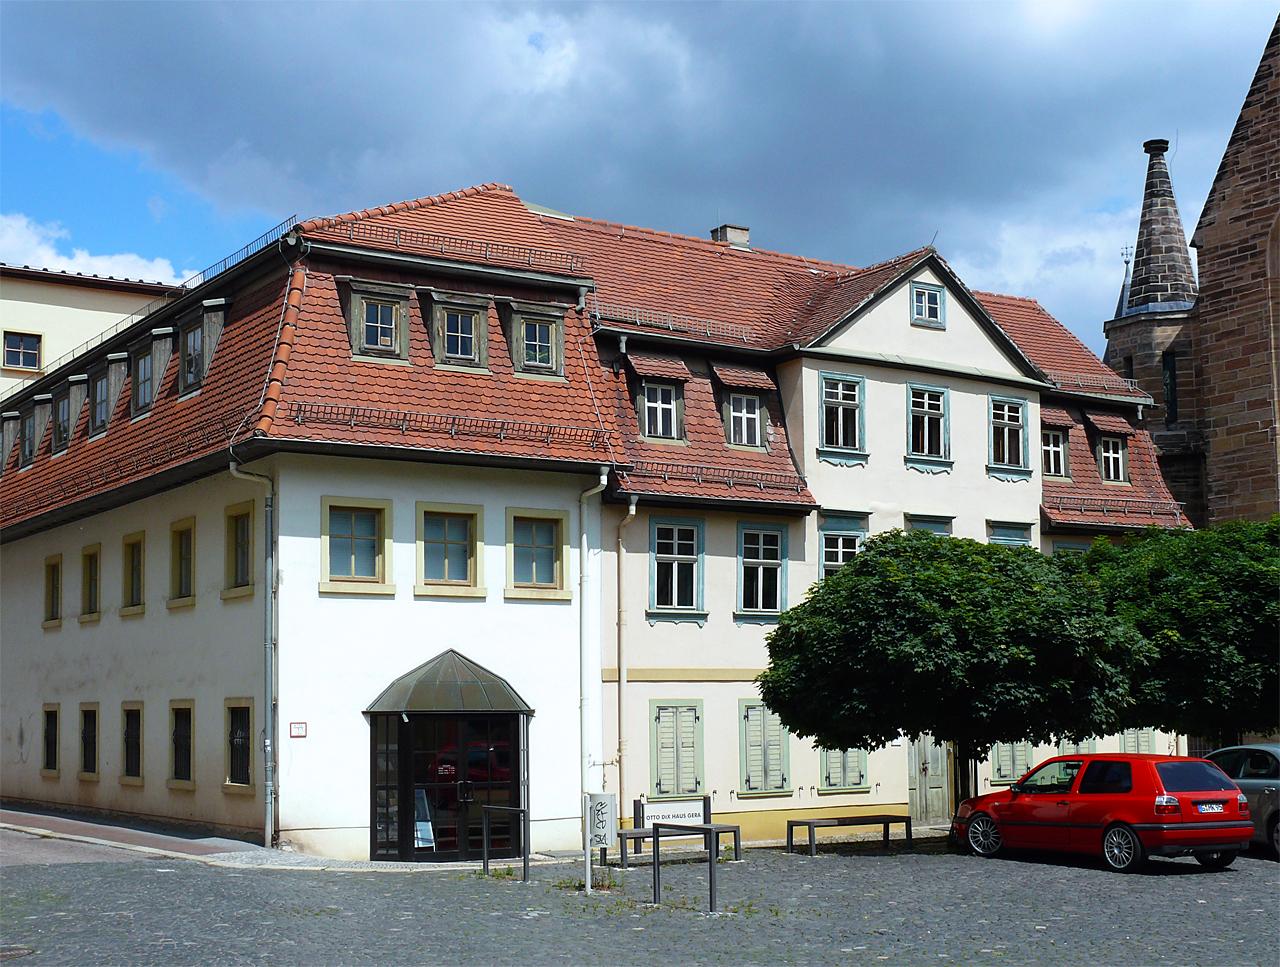 Bild Otto Dix Haus Gera